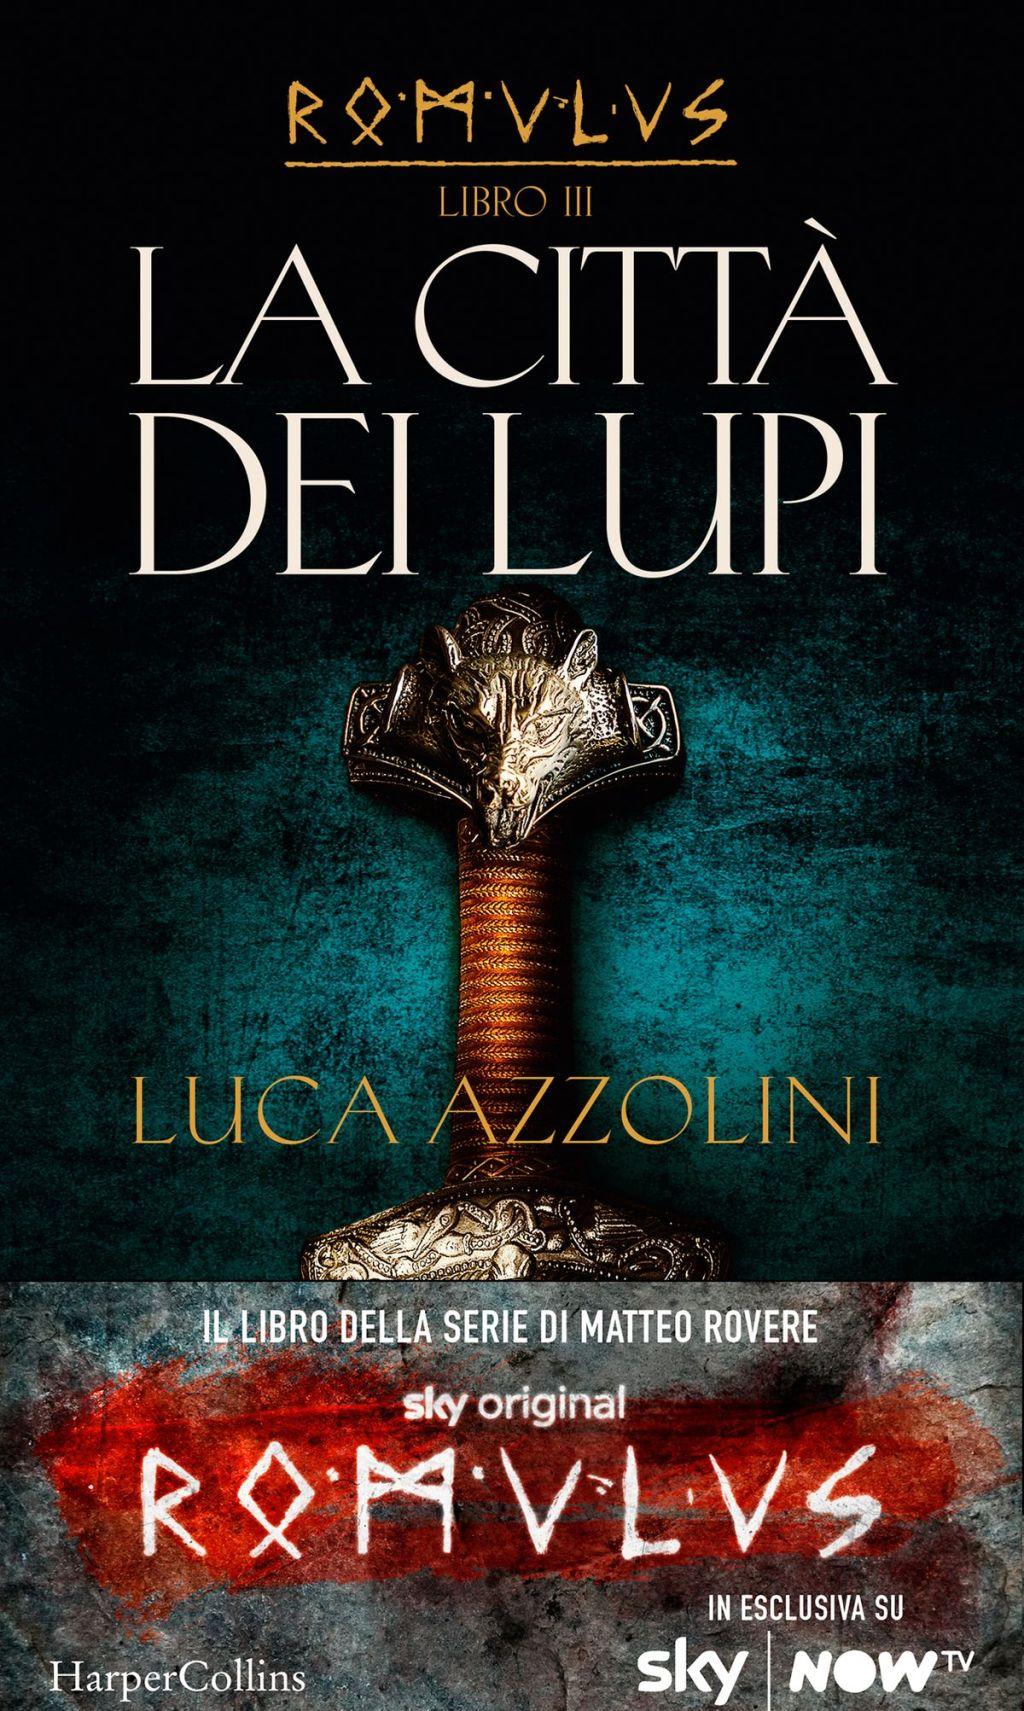 Luca Azzolini